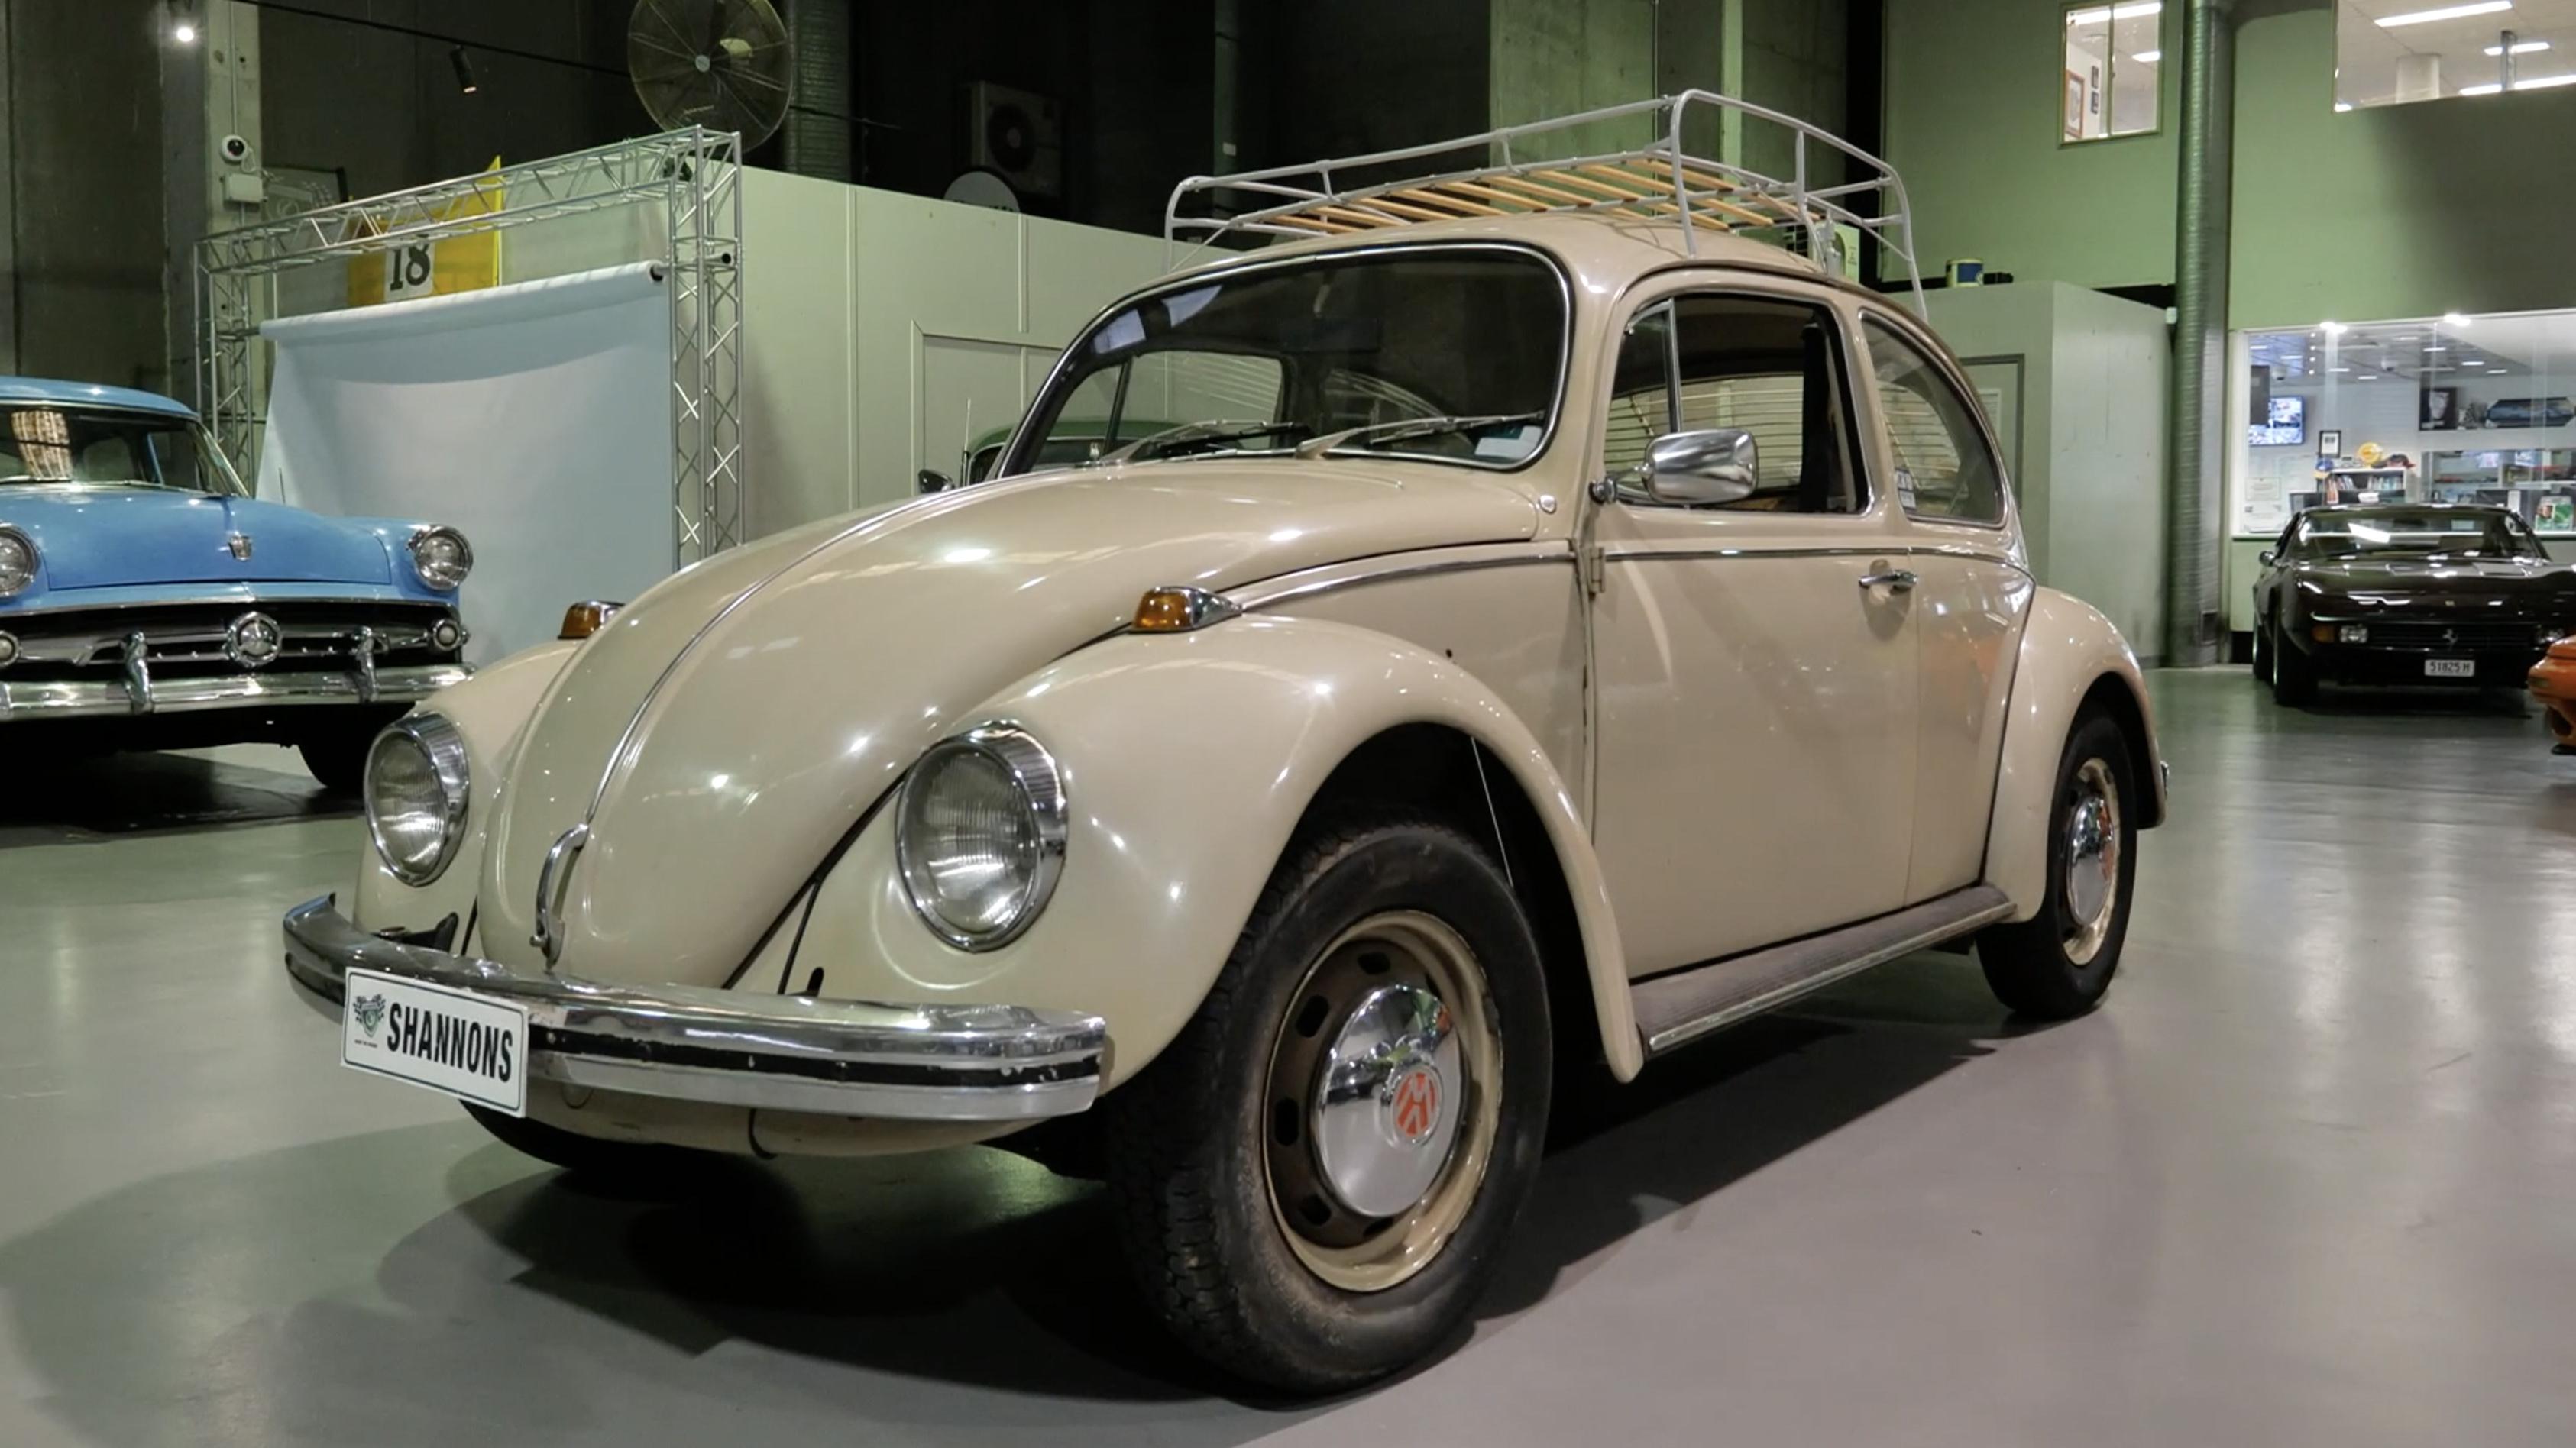 1969 Volkswagen Beetle 1500S Sedan - 2020 Shannons Spring Timed Online Auction